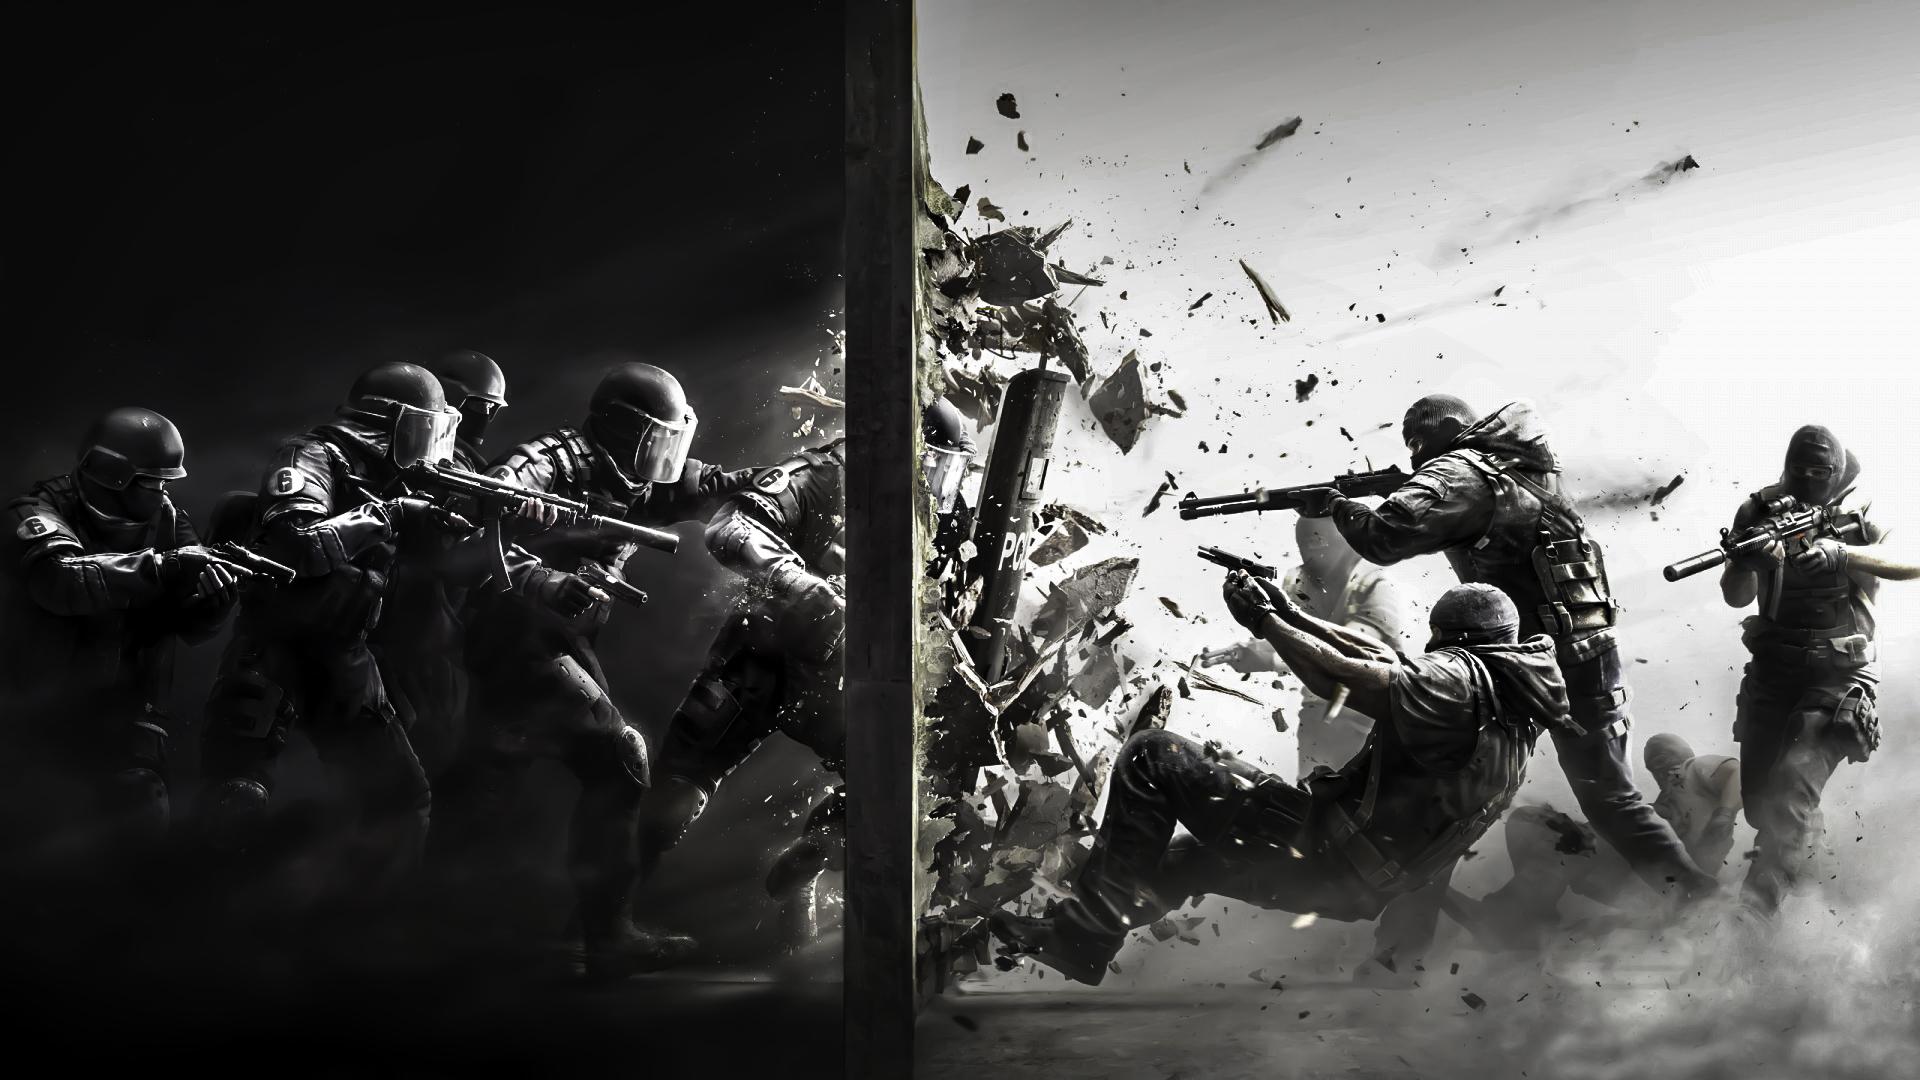 Tom Clancy's Rainbow Six Siege - PS4Wallpapers.com